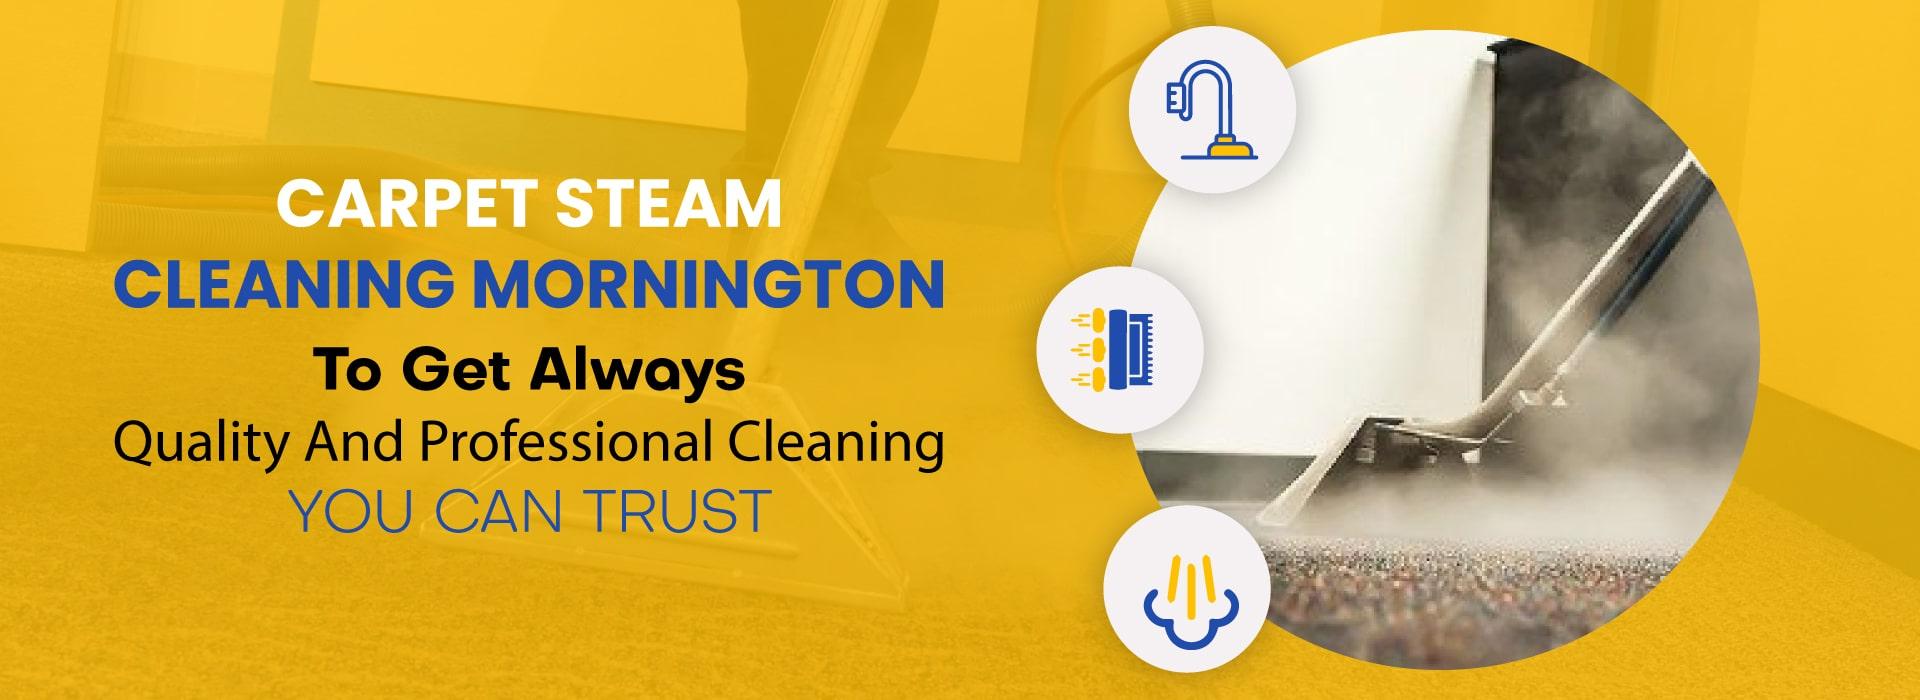 Carpet-Steam-Cleaning-Mornington